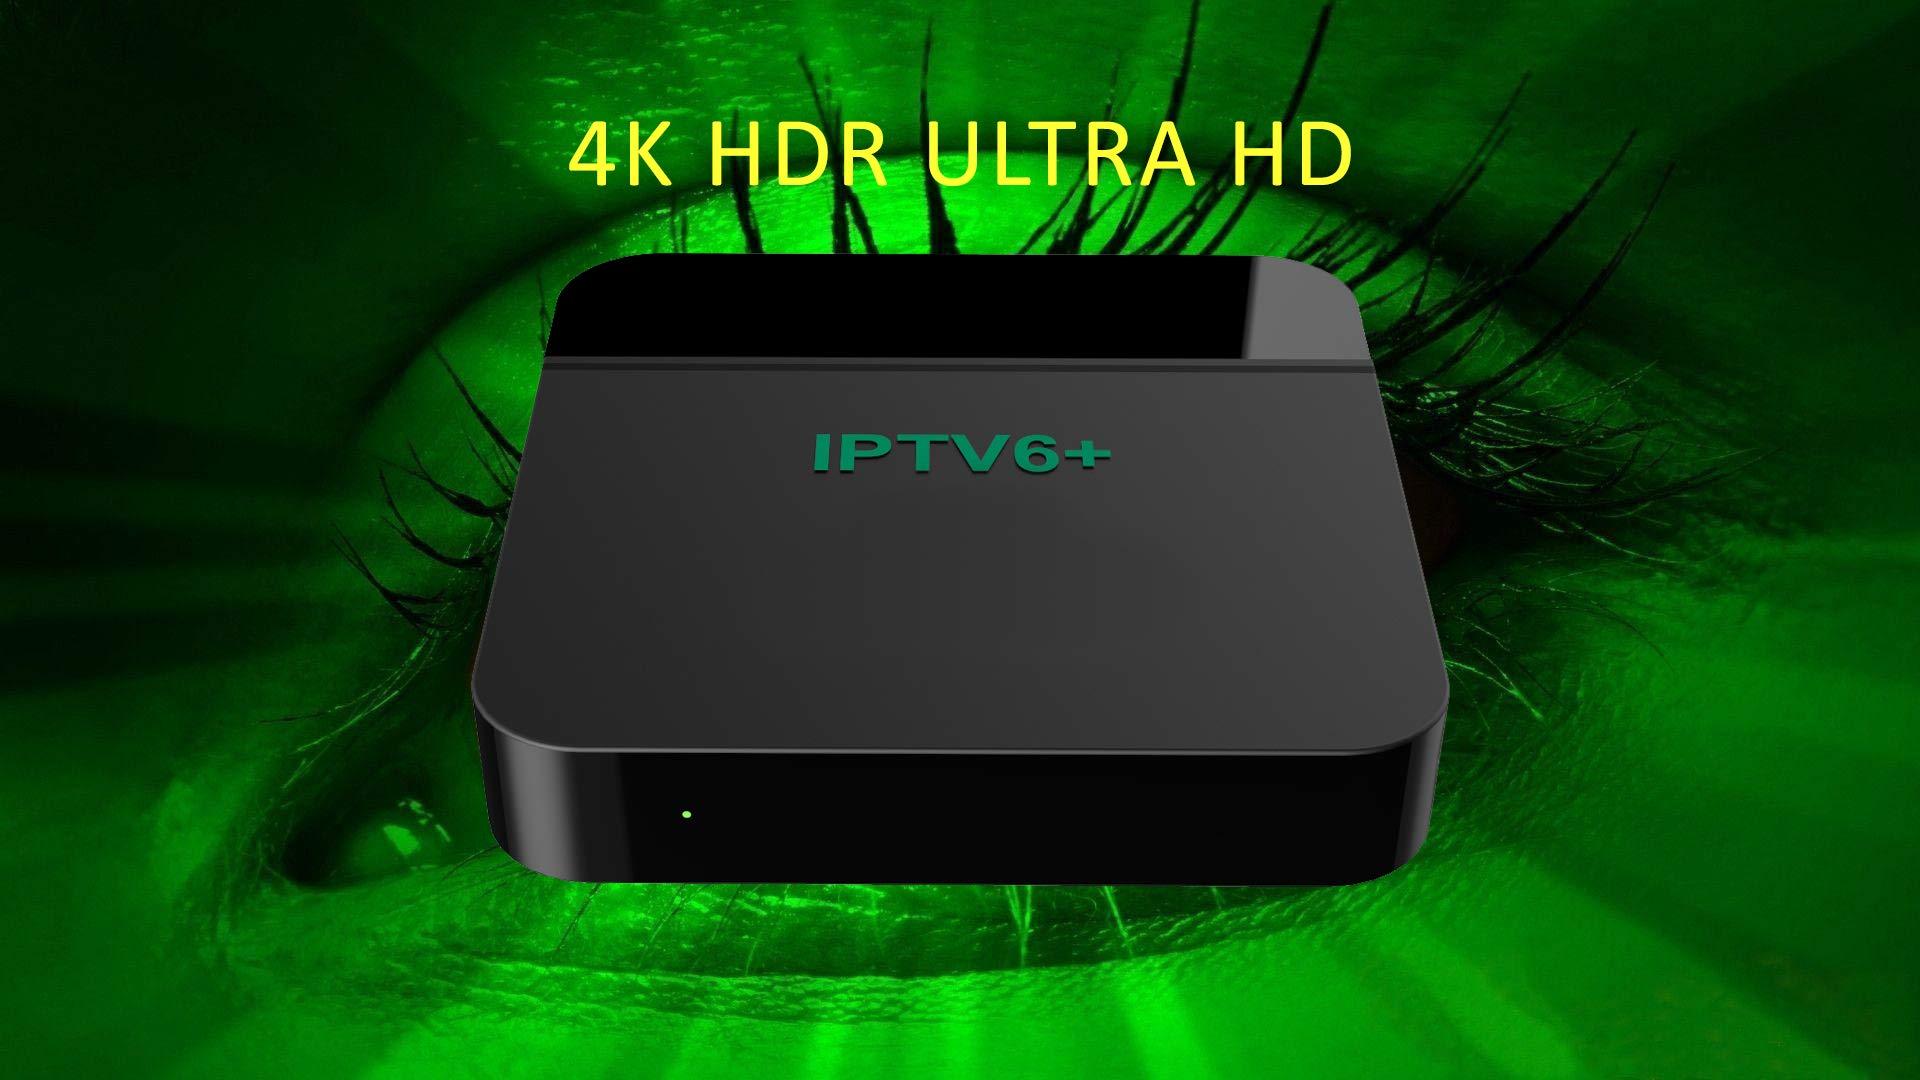 2019 Official IPTV6 Brazil Box Based On HTV6 HTV 6, HTV5 HTV 5 IPTV5 4k  canais do Brazil Upgraded, Live Brazilian IP TV Channels, Movies, TV